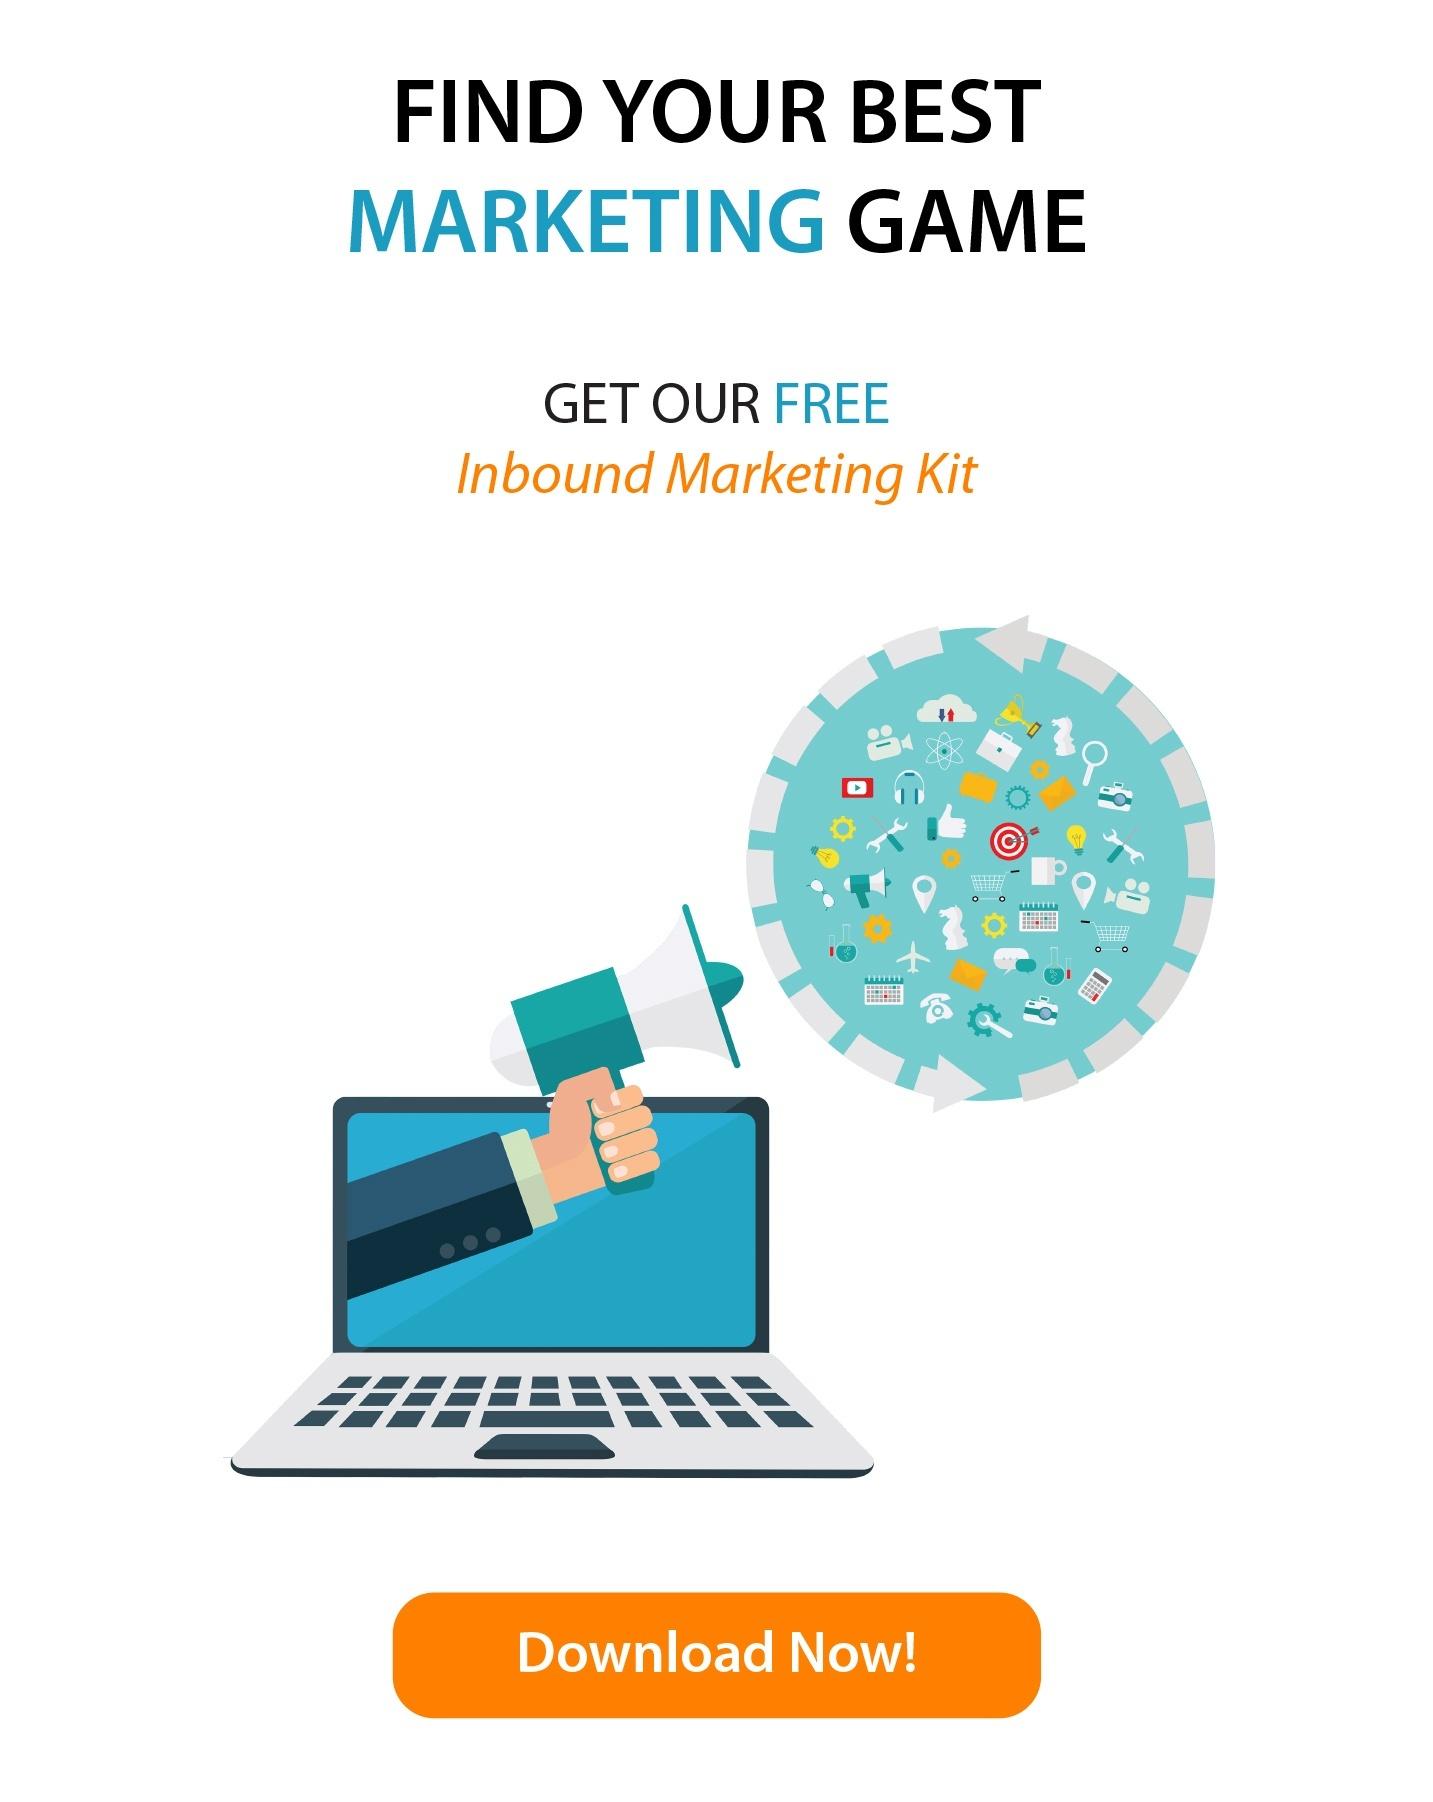 Find your best marketing game